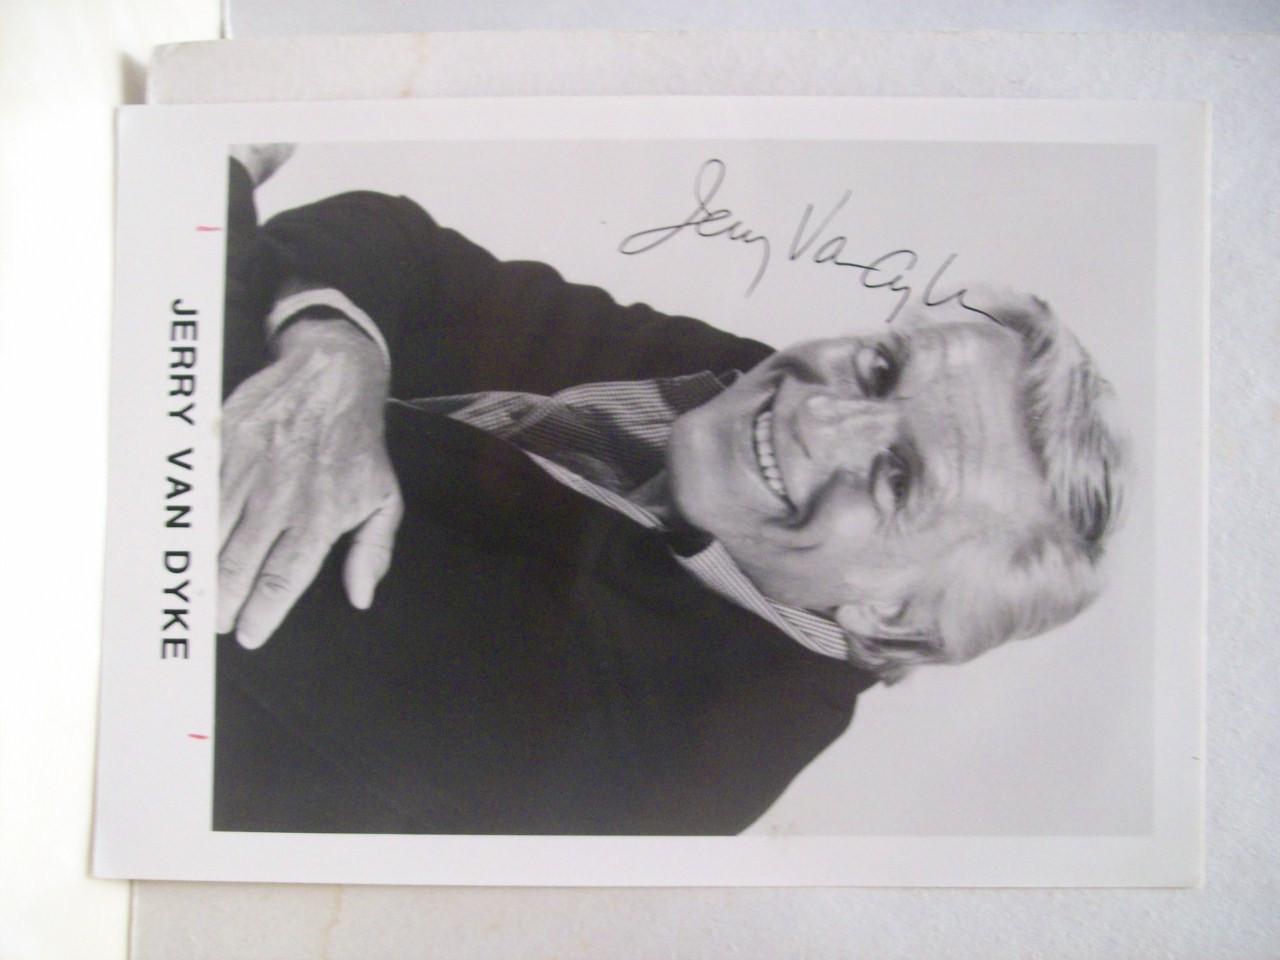 Van Dyke, Jerry Photo Signed Autograph Dick Van Dyke Show